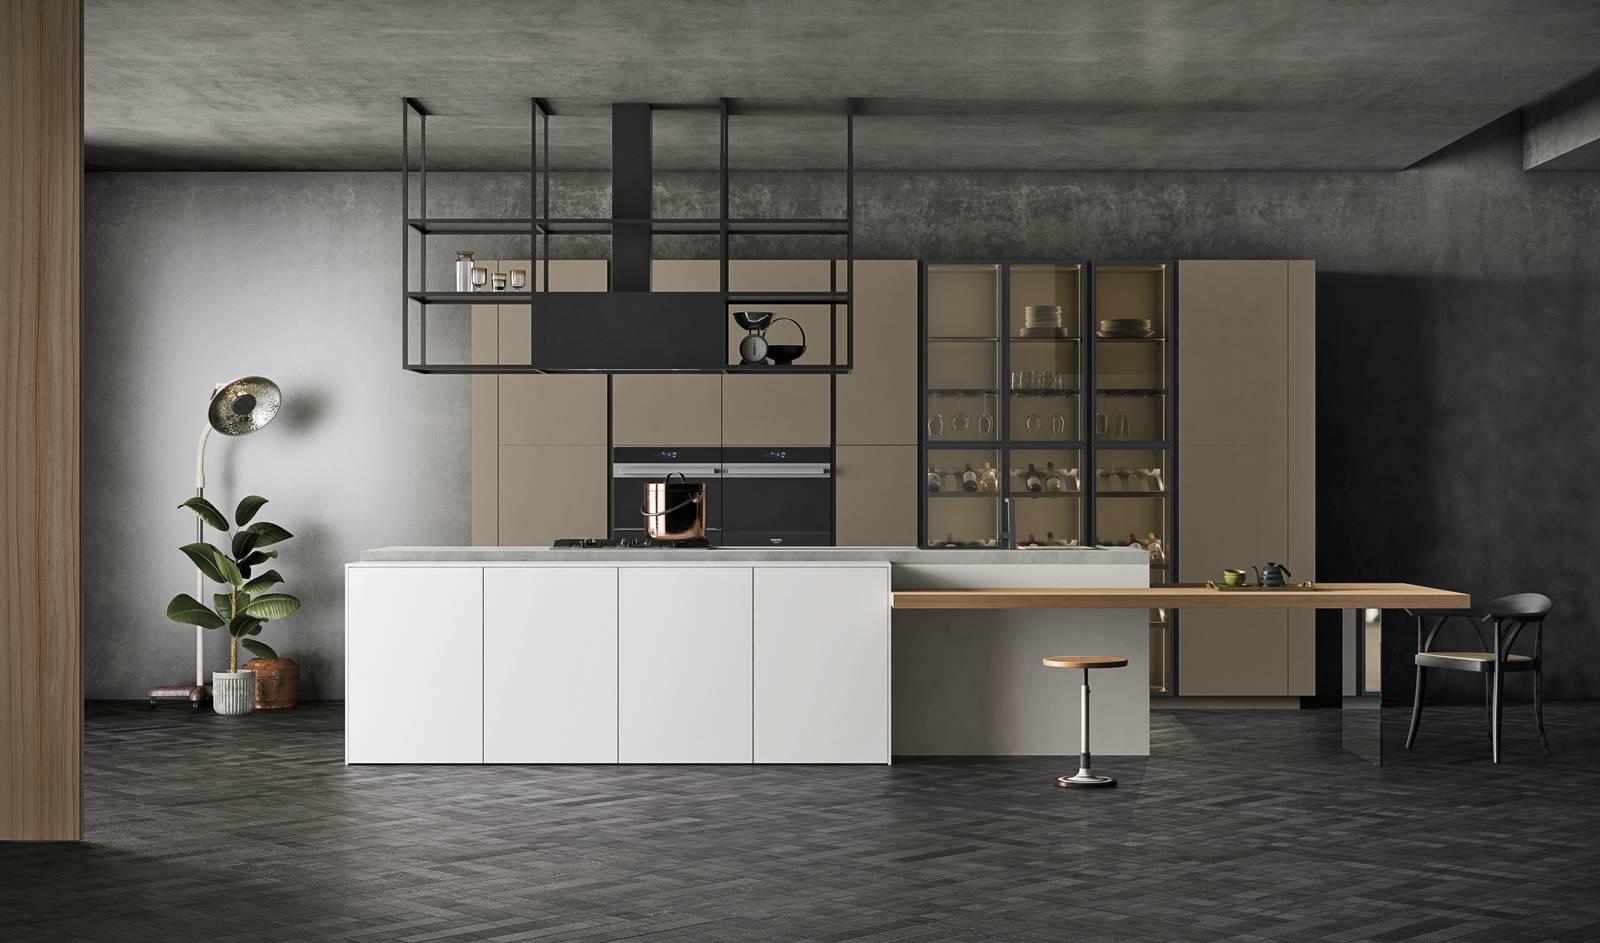 Speciale cucina focus sulla cappa che arreda cose di casa - Cappa cucina bianca ...